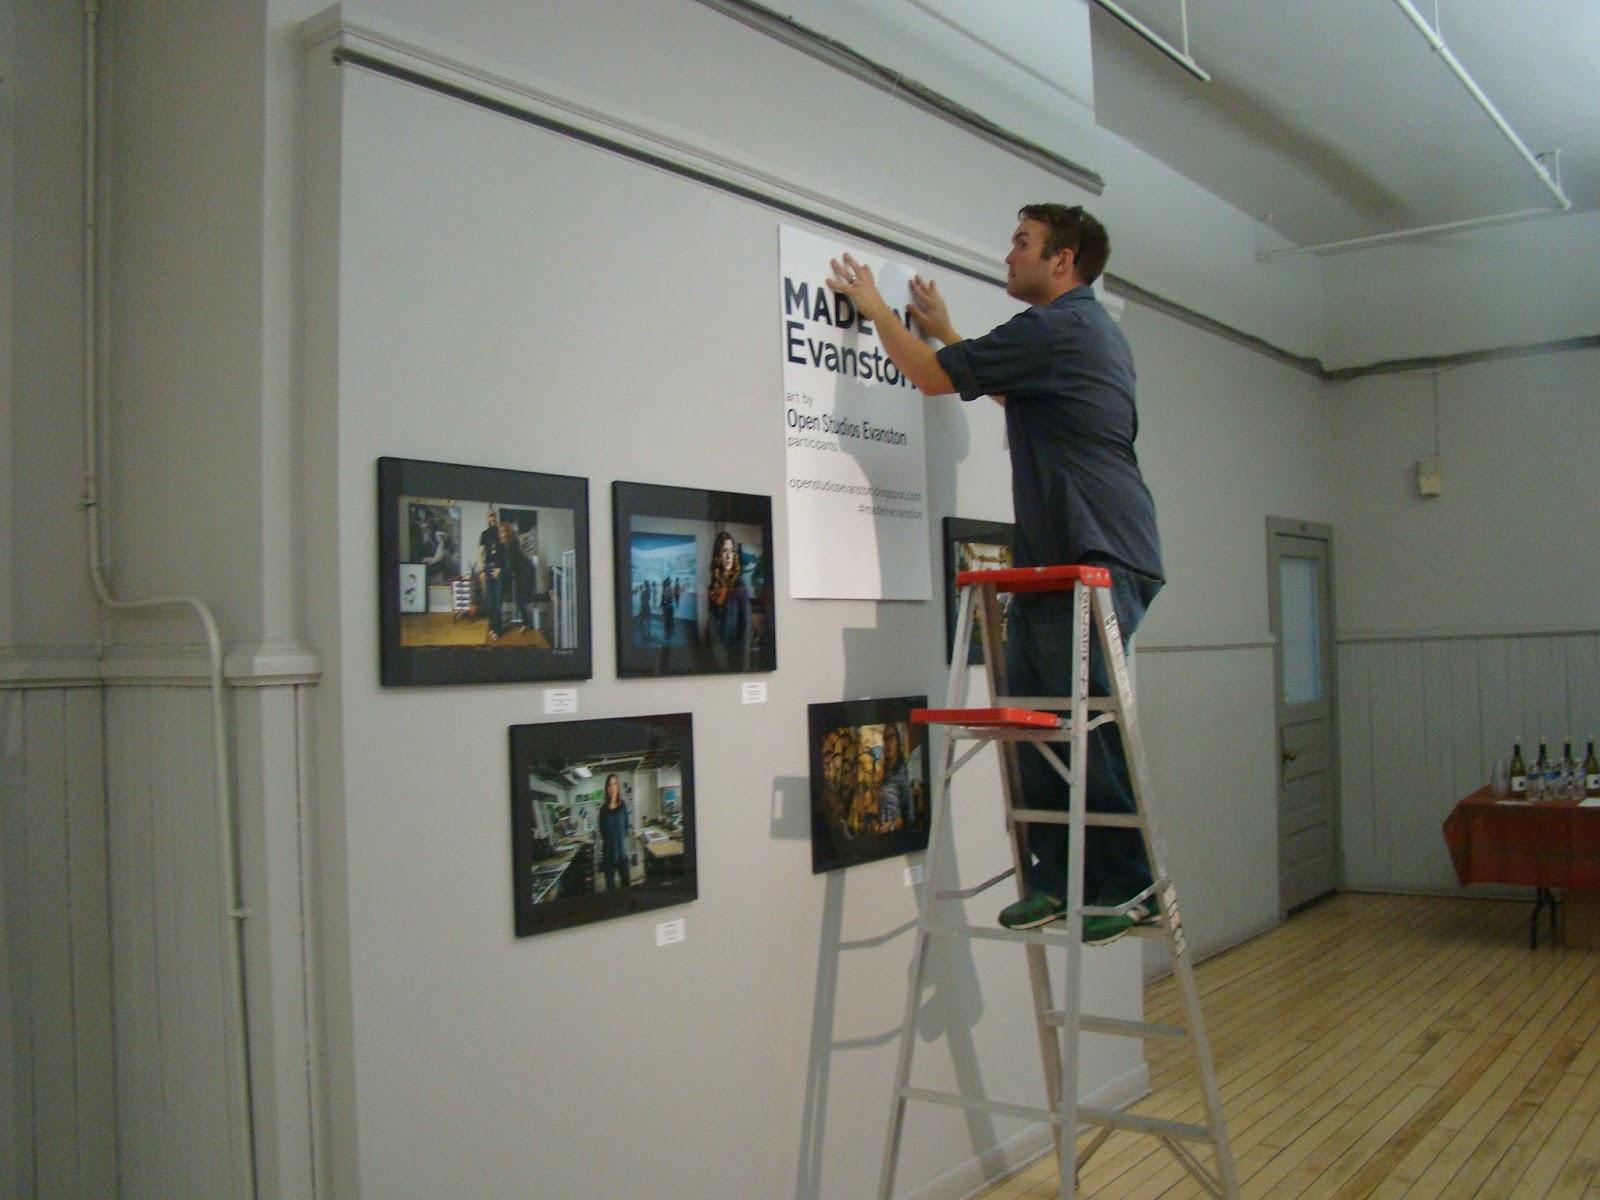 photos made in evanston exhibit